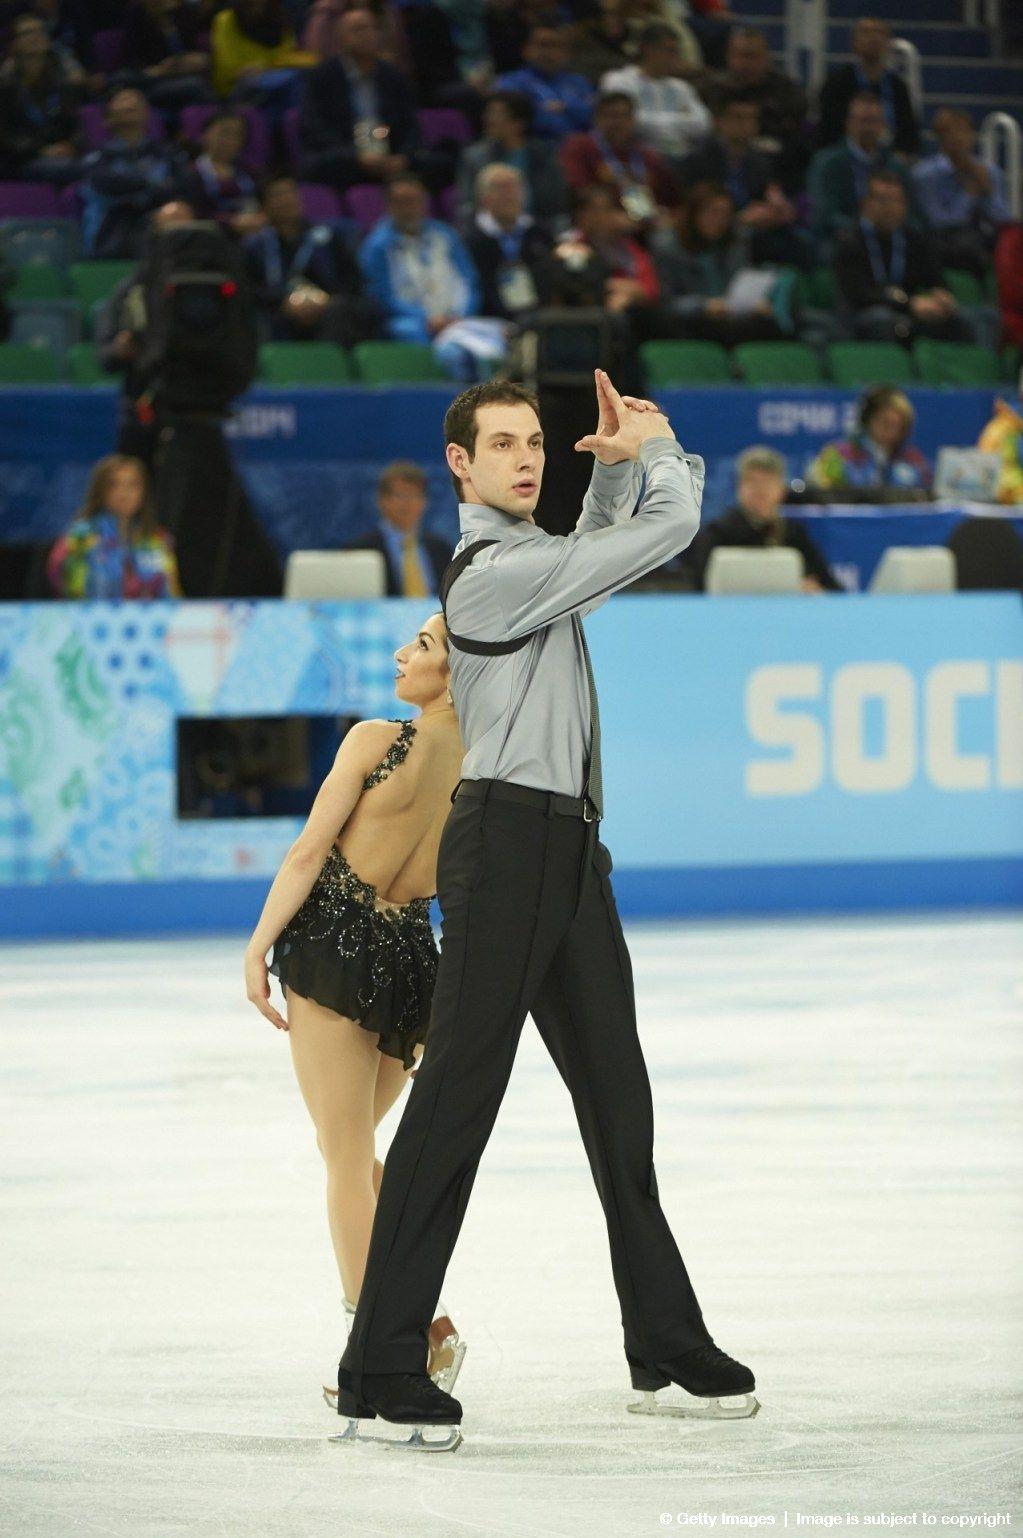 2014 Winter Olympics - Day 5